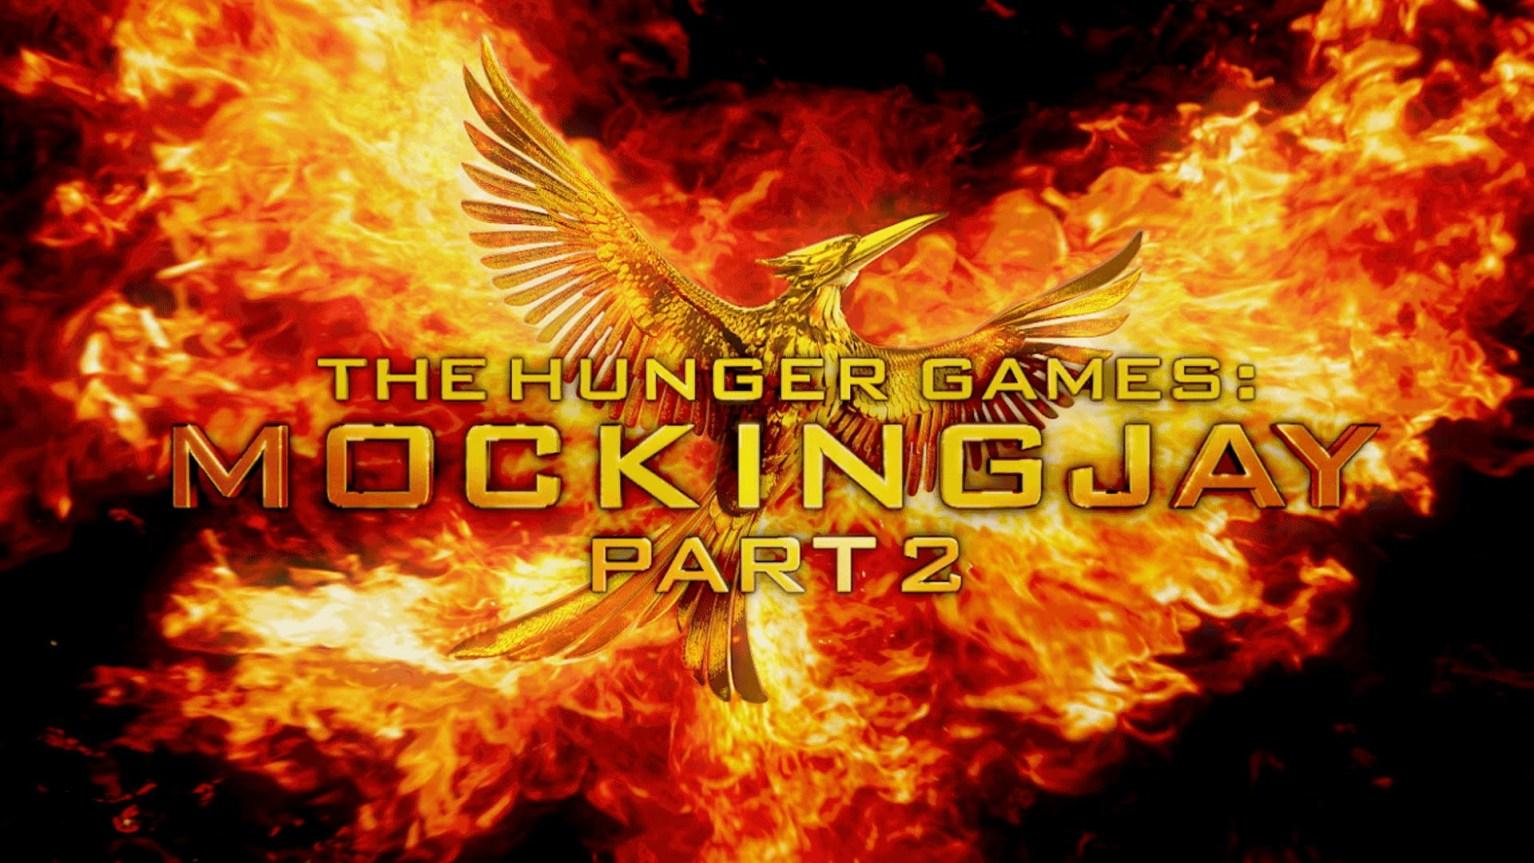 The Hunger Games – Mockingjay Part 2 – az első teaser poster